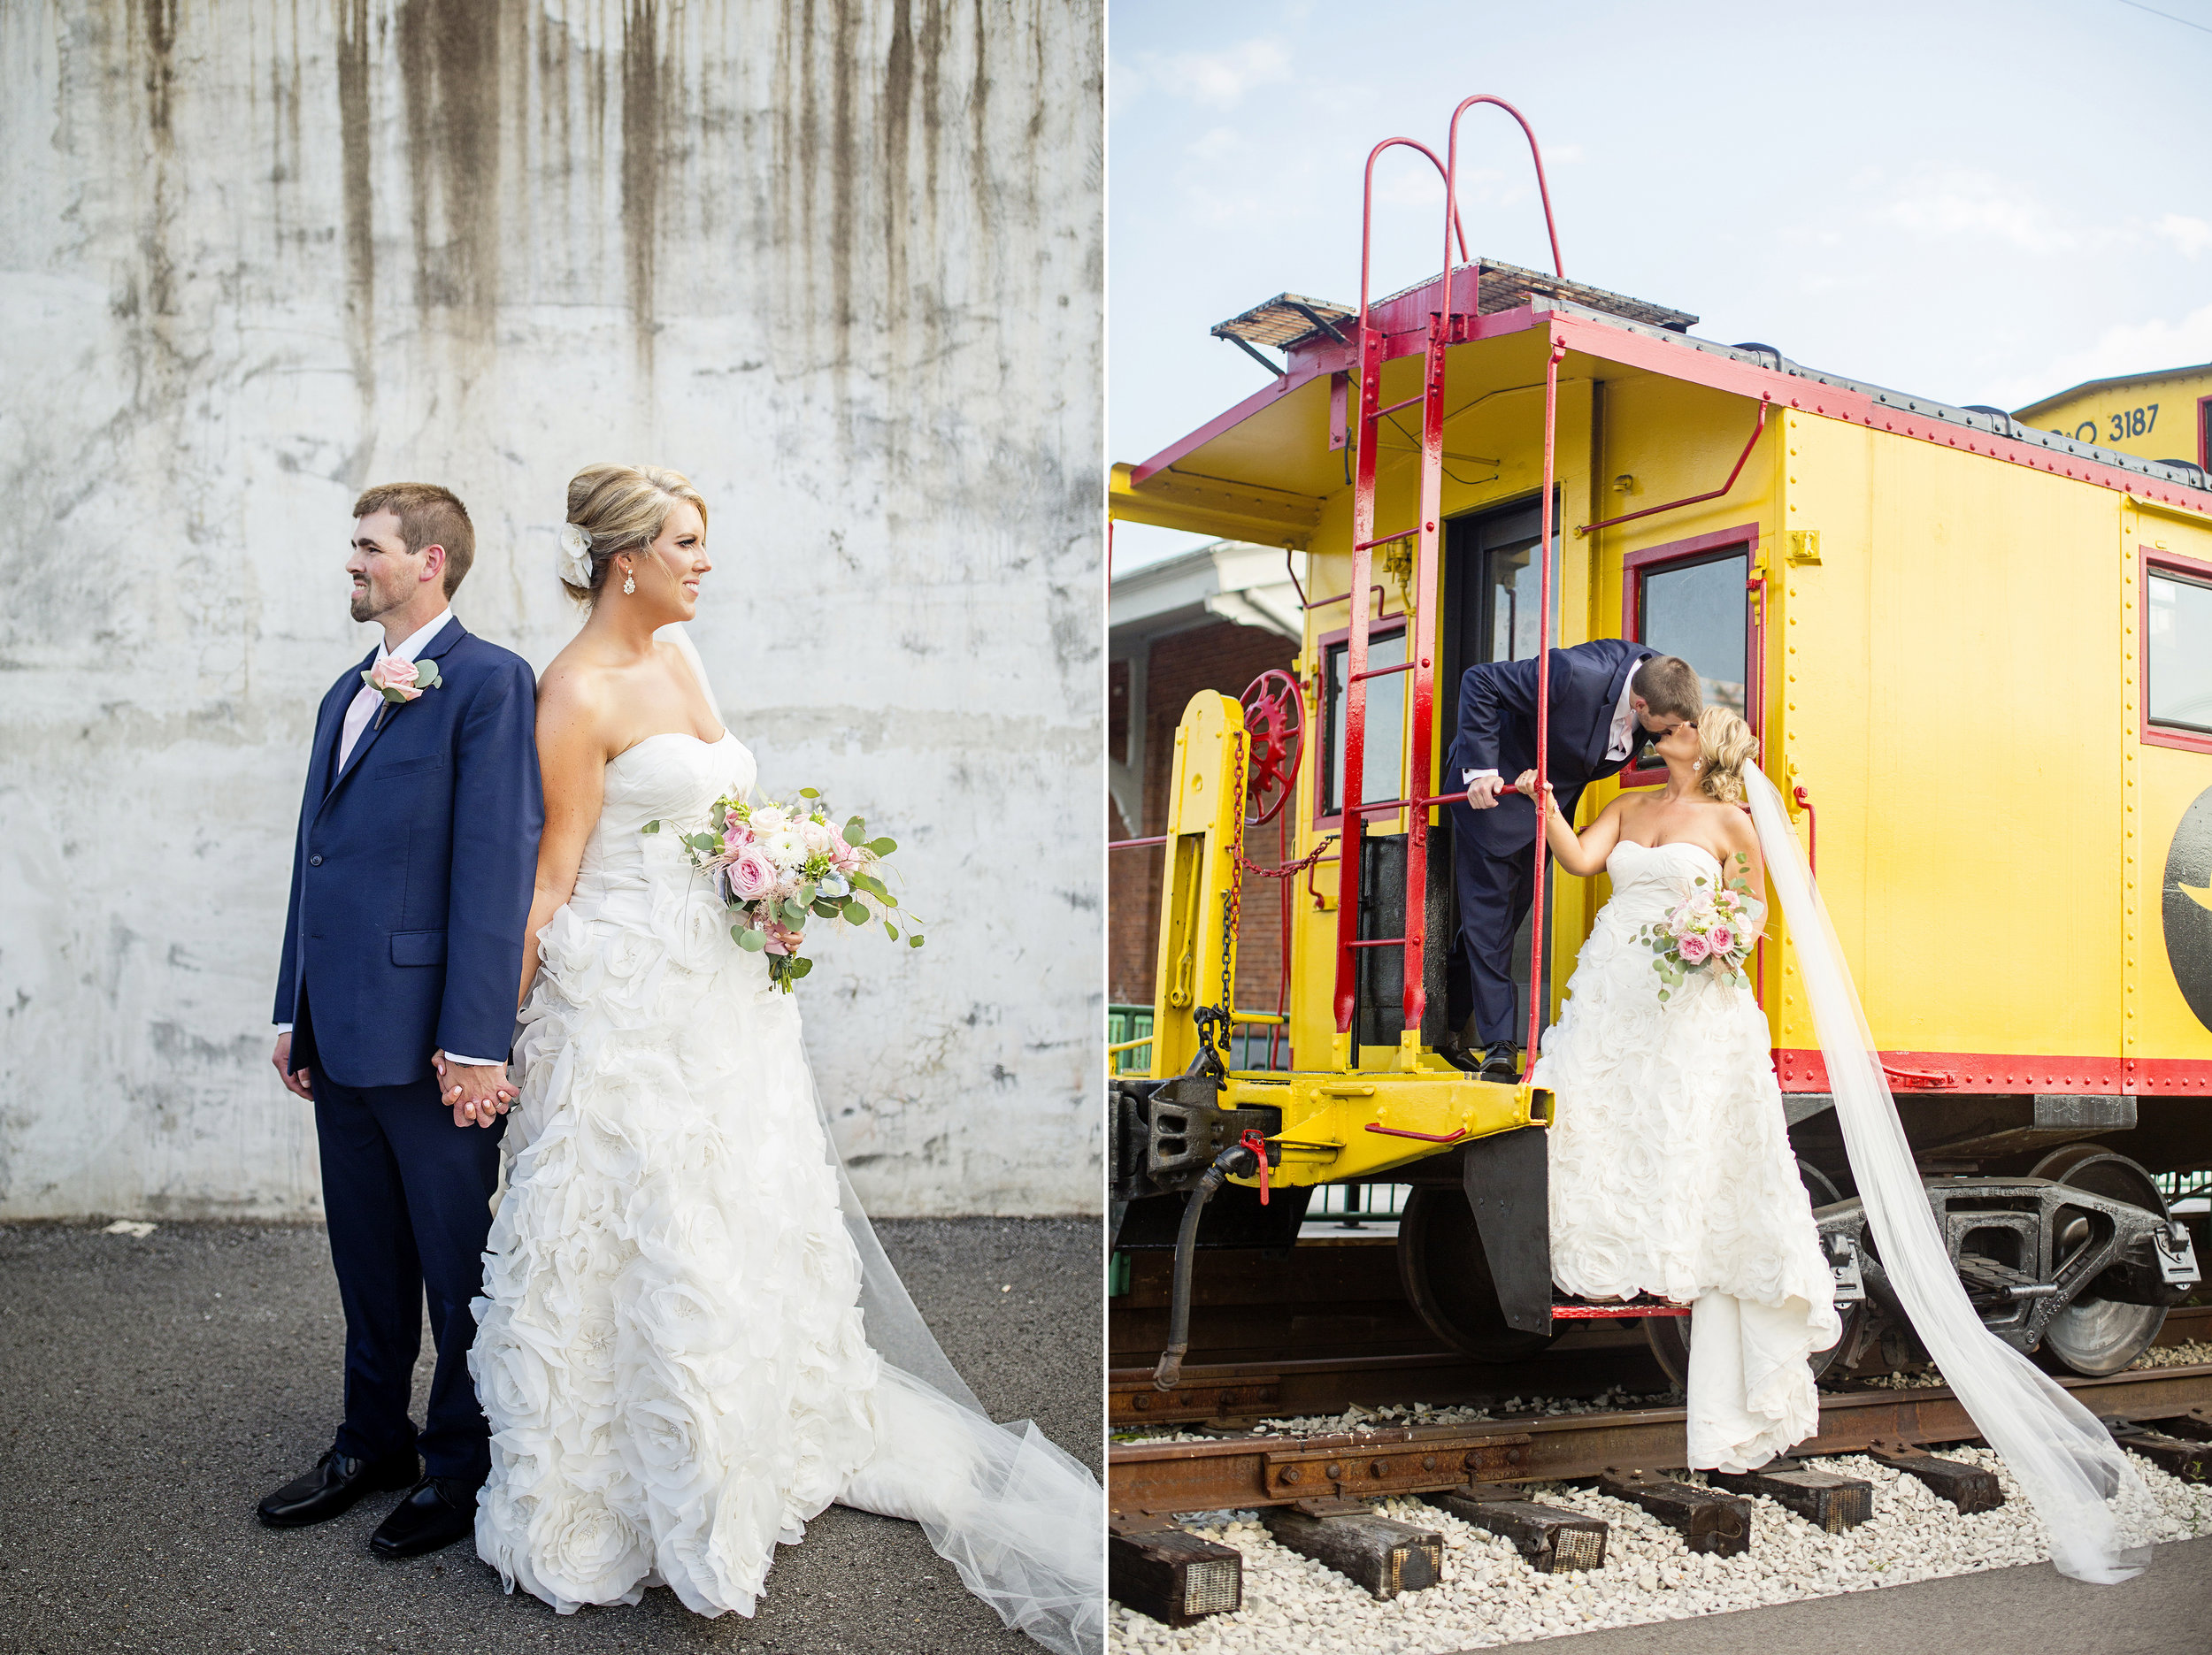 Seriously_Sabrina_Photography_Ashland_Kentucky_Train_Depot_Wedding_Parsons56.jpg